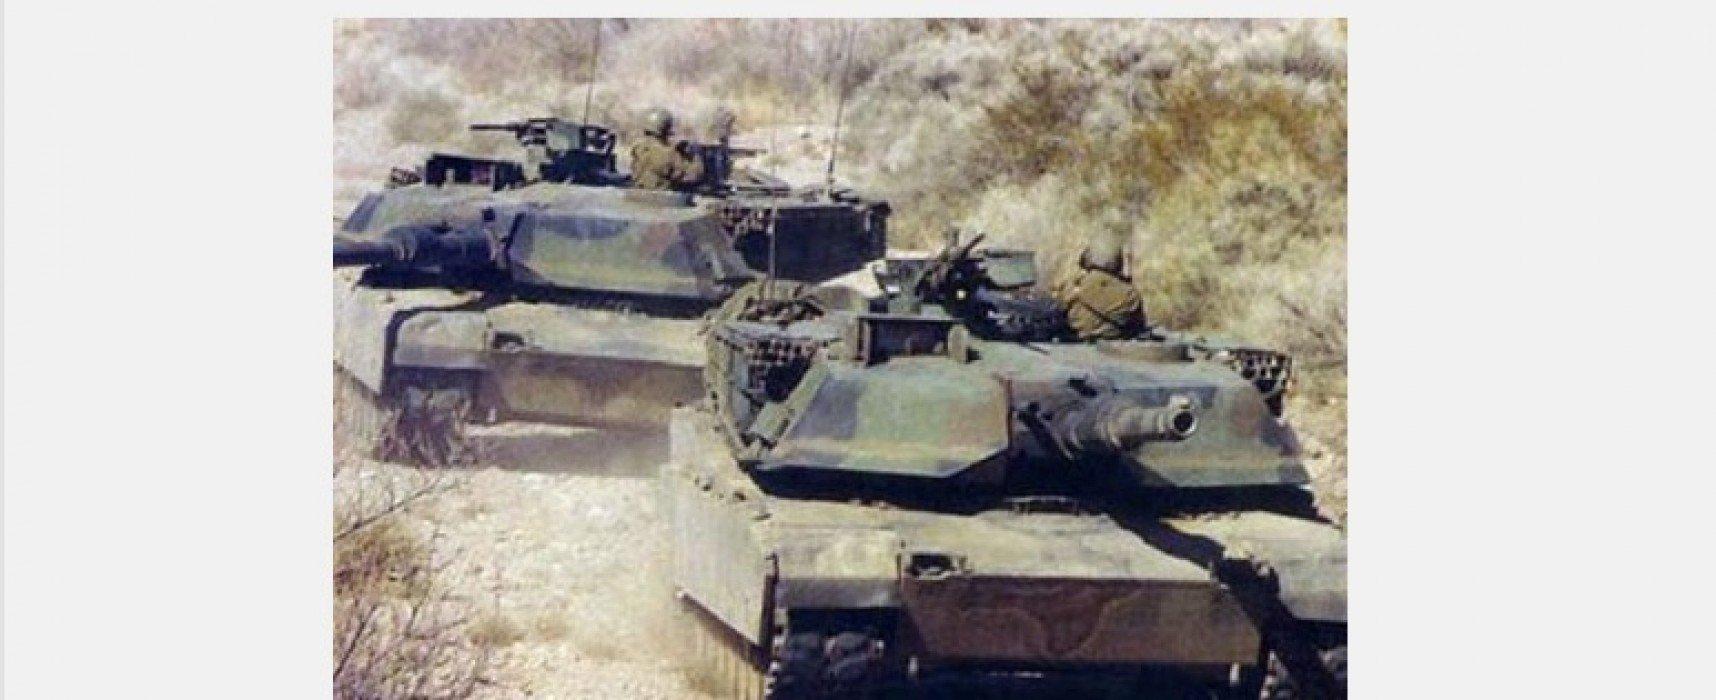 Photo Fake by Russkaya Vesna: American Tanks in Antiterrorist Operation Area